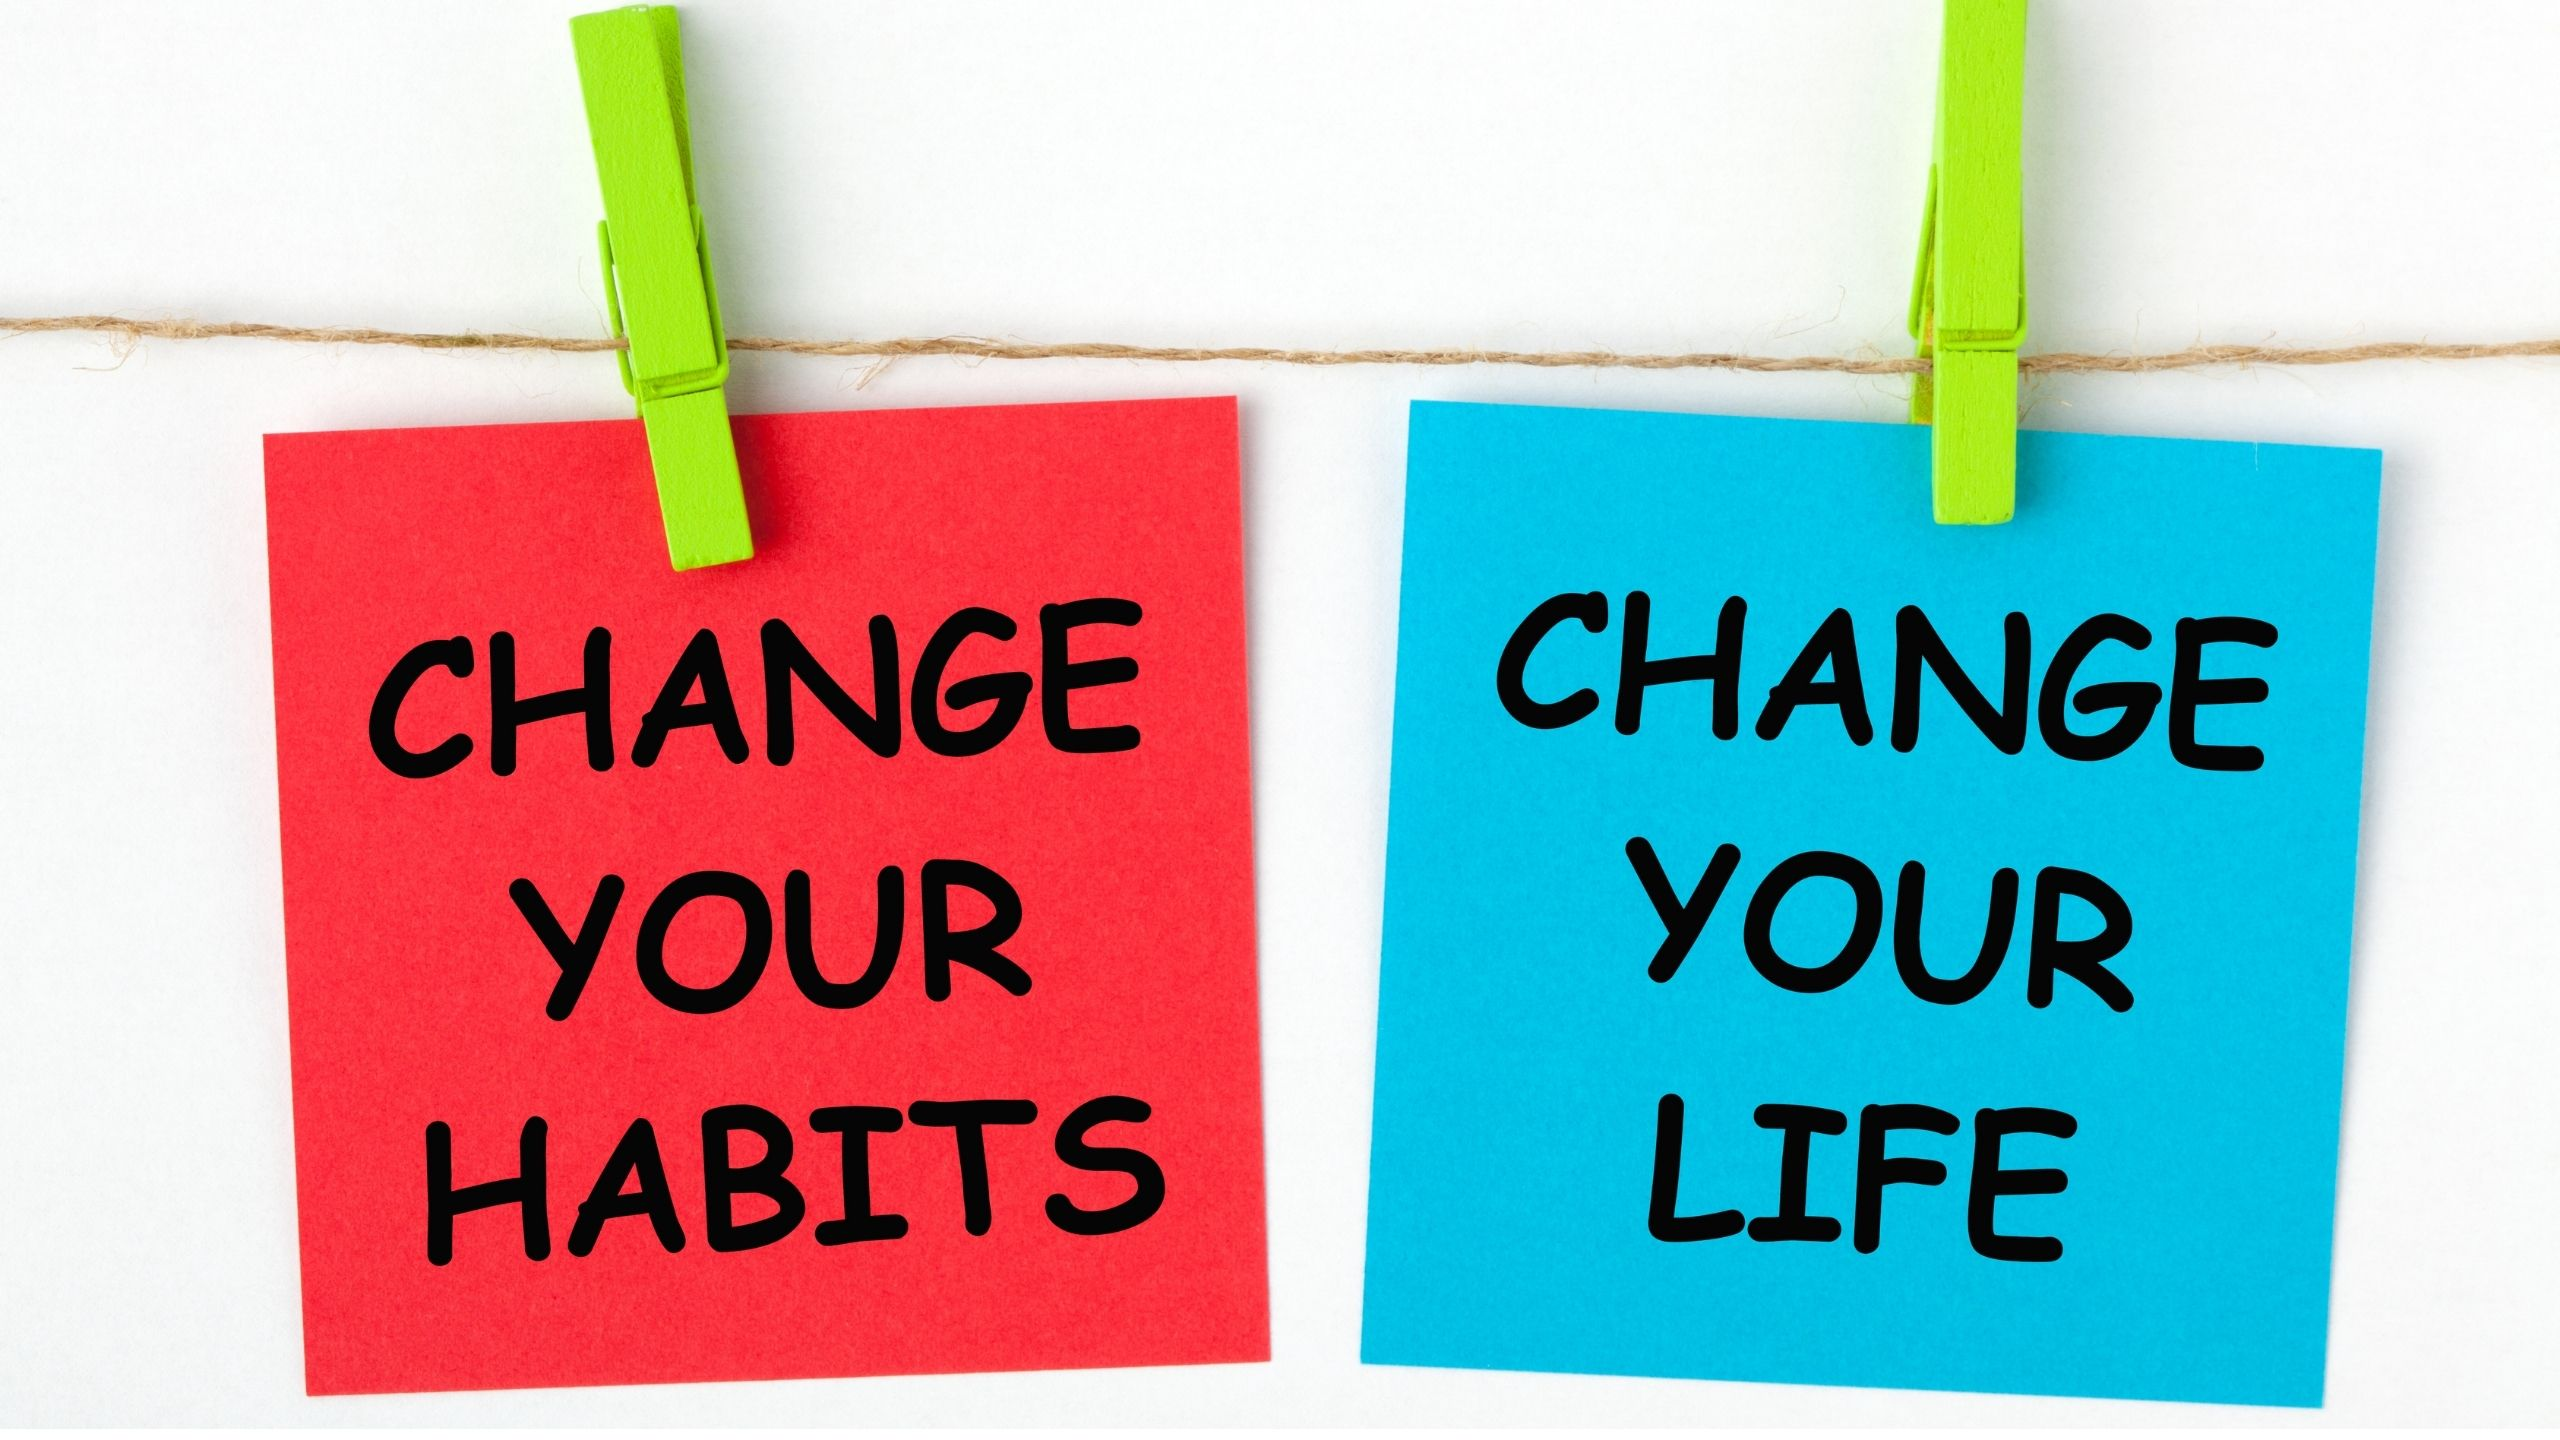 Change Your Habits Change Your LIfe